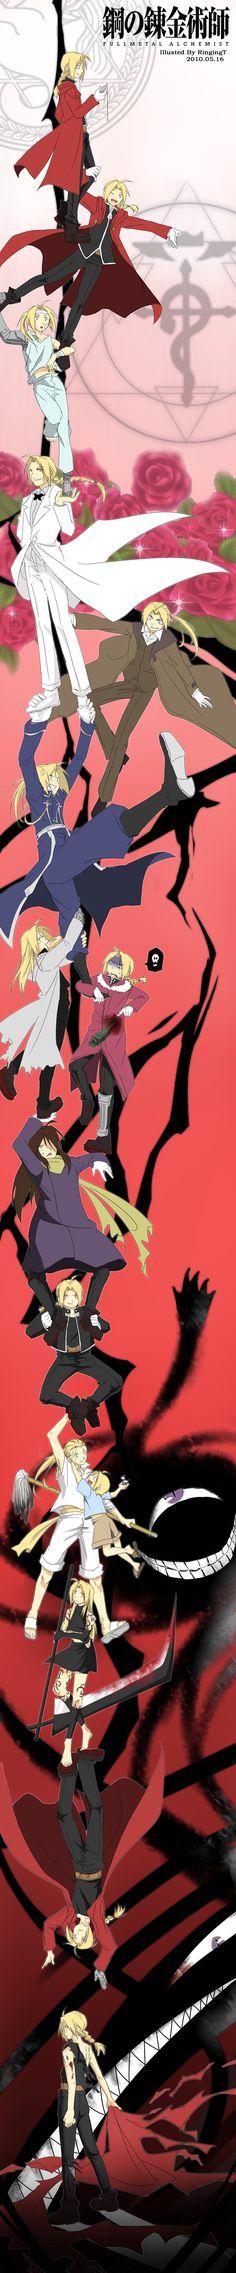 Just finished Fullmetal Alchemist: Brotherhood. A wonderful ending!<======== One of my favorite animes!!!!